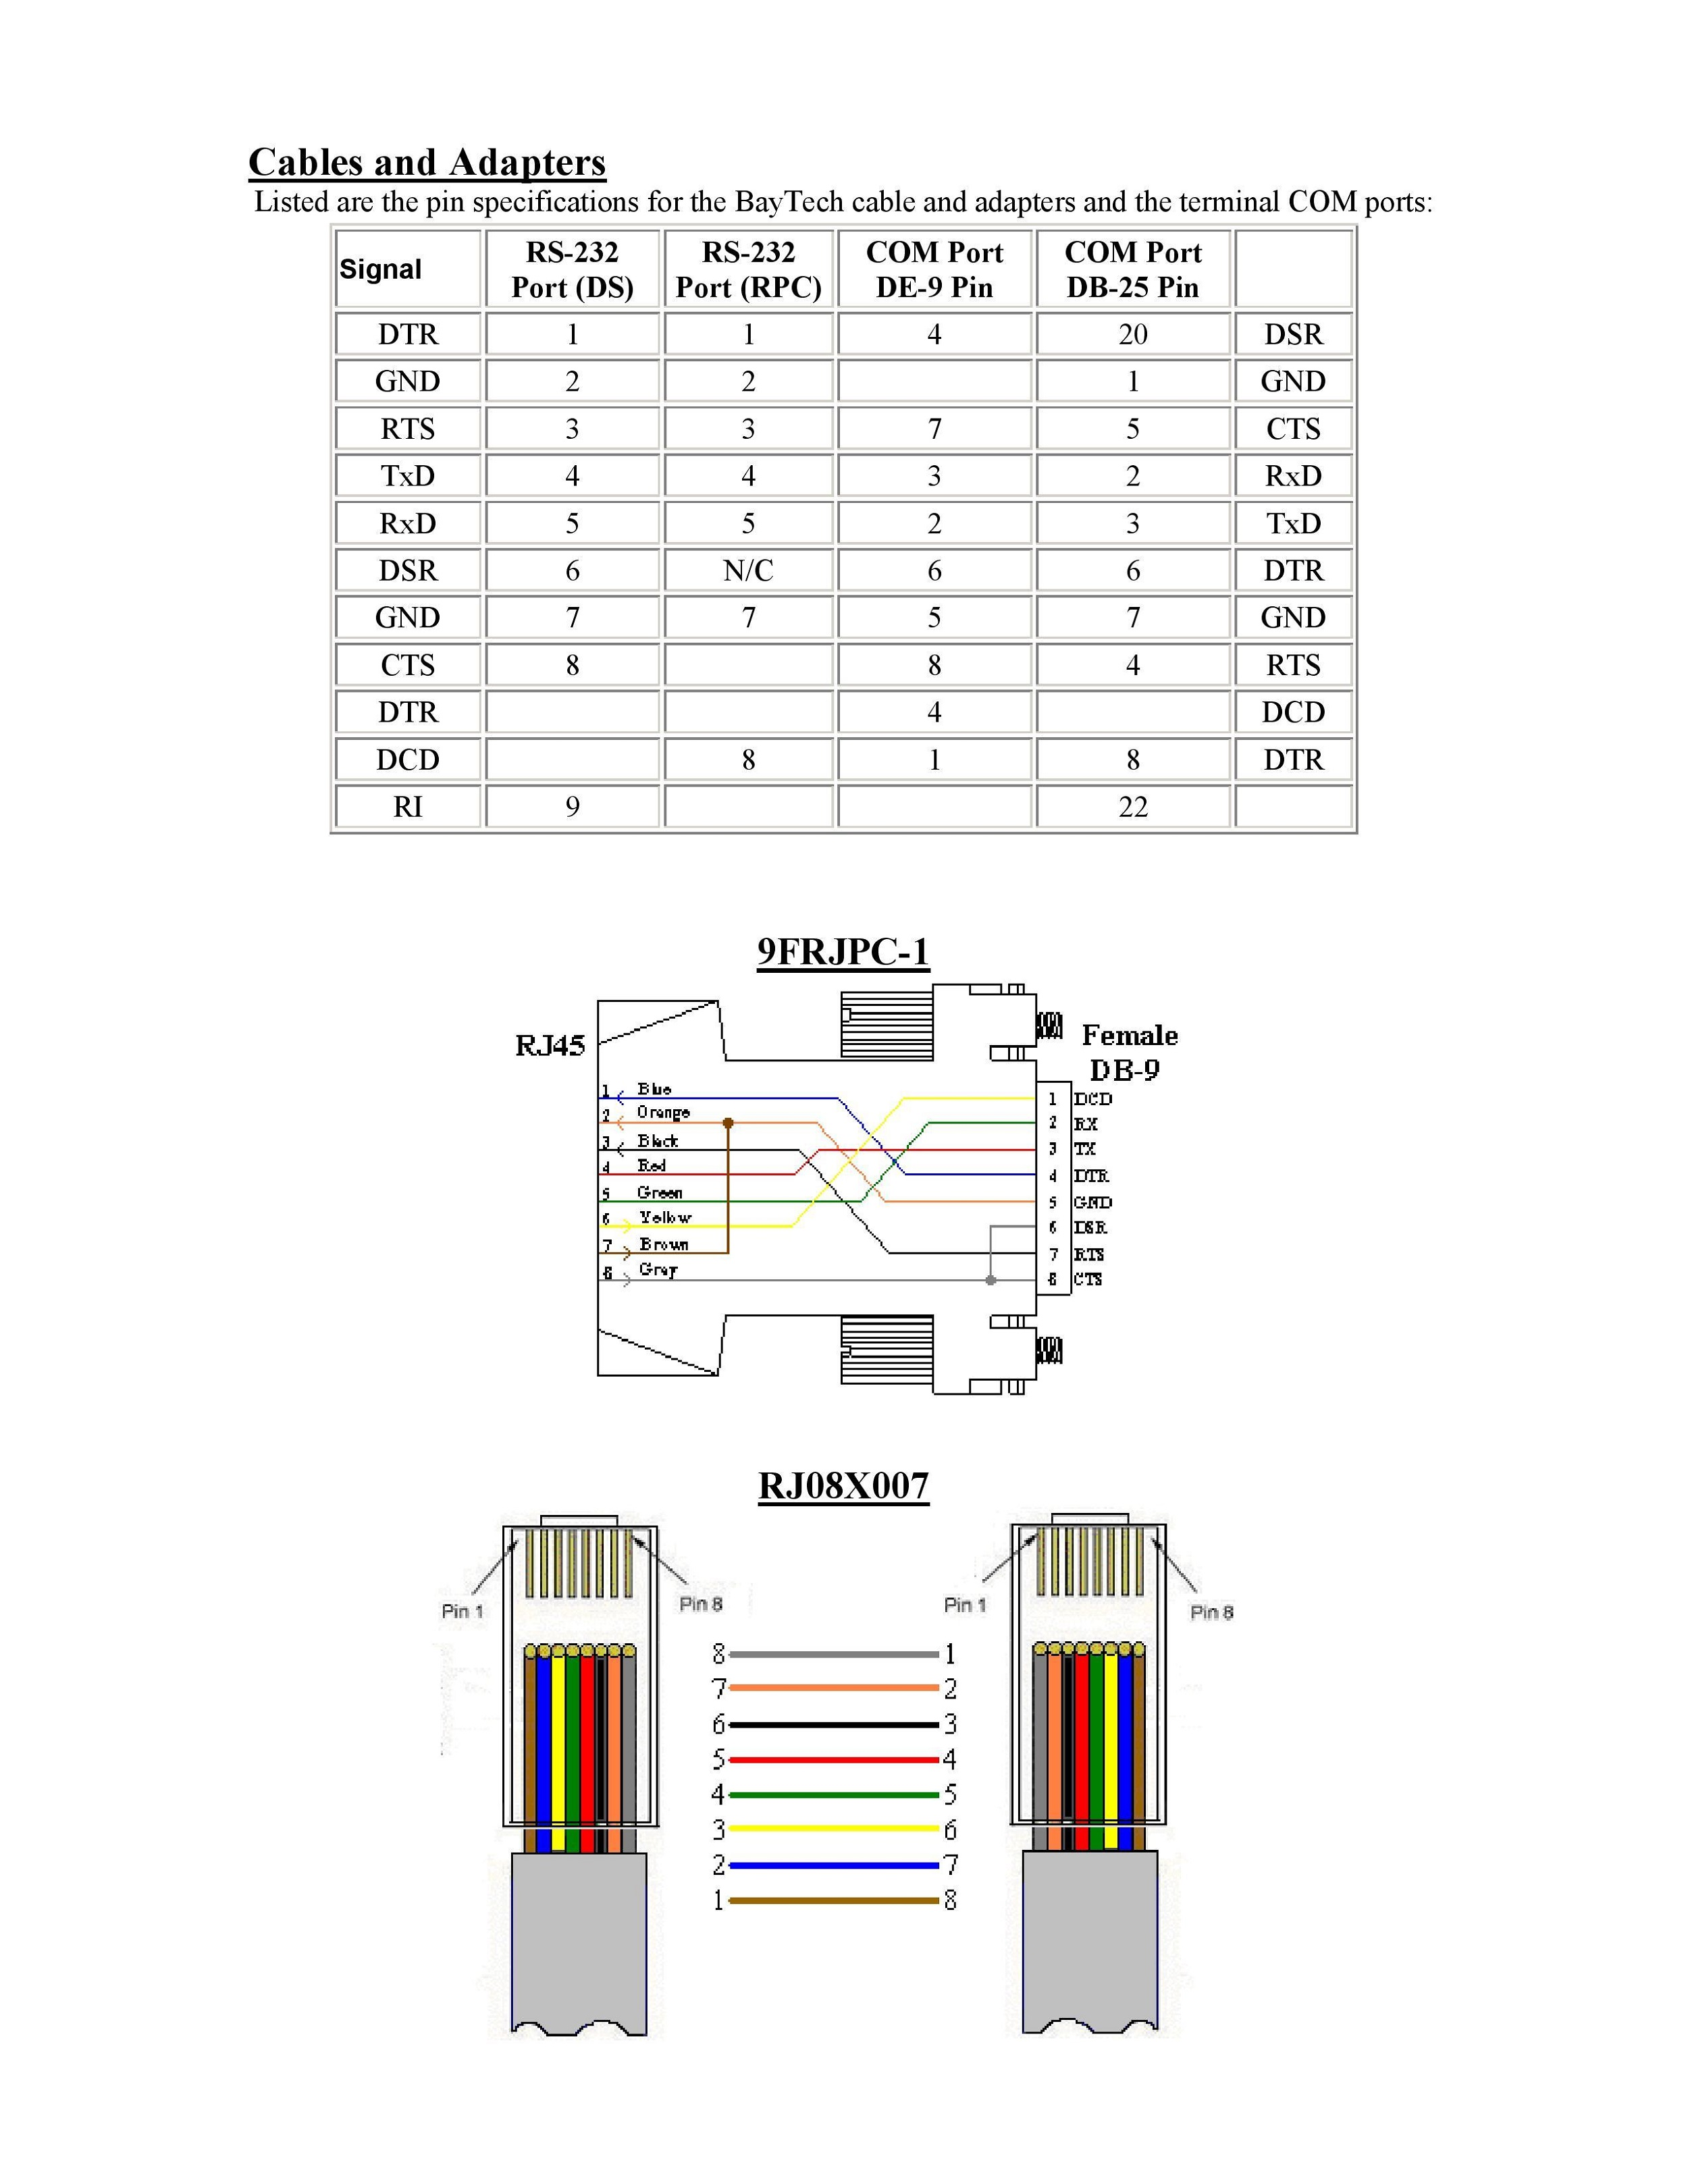 Cat5 Wiring Diagram Printable 1969 Camaro Wiring Diagram Manual Free Pdf Contuor Cukk Jeanjaures37 Fr